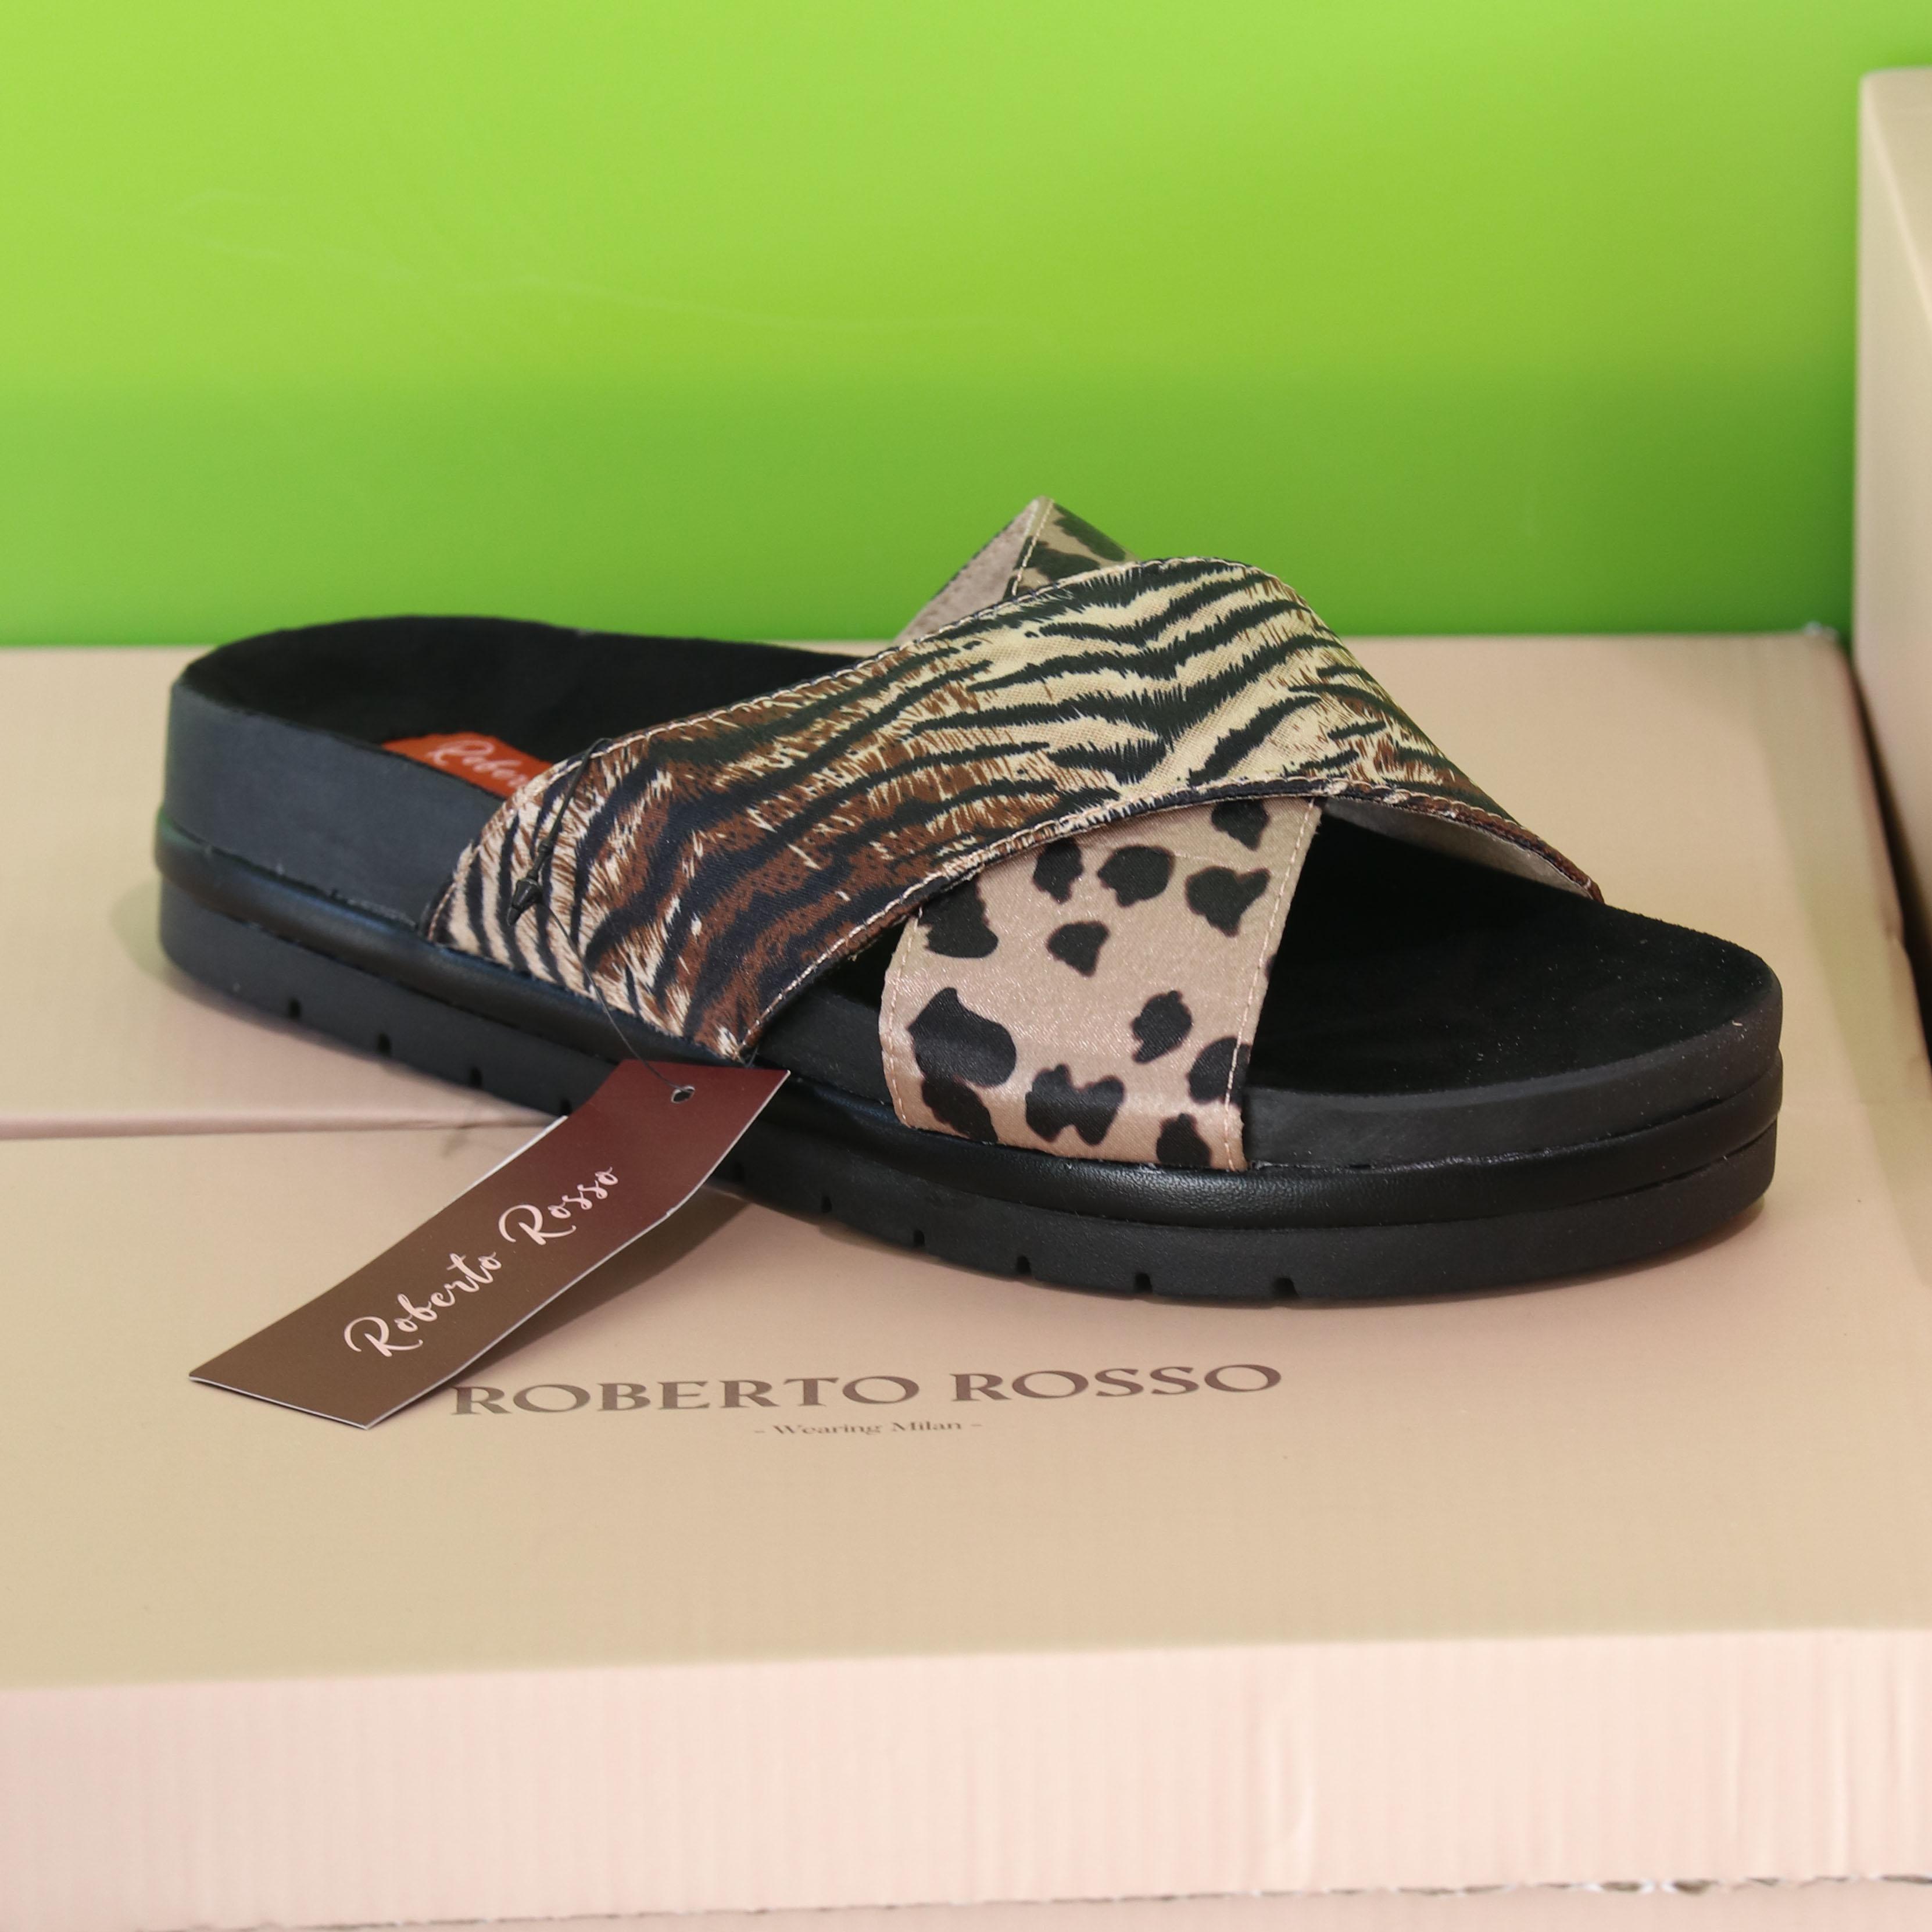 roberto rosso – oreadi leopard slippers sommer dame2